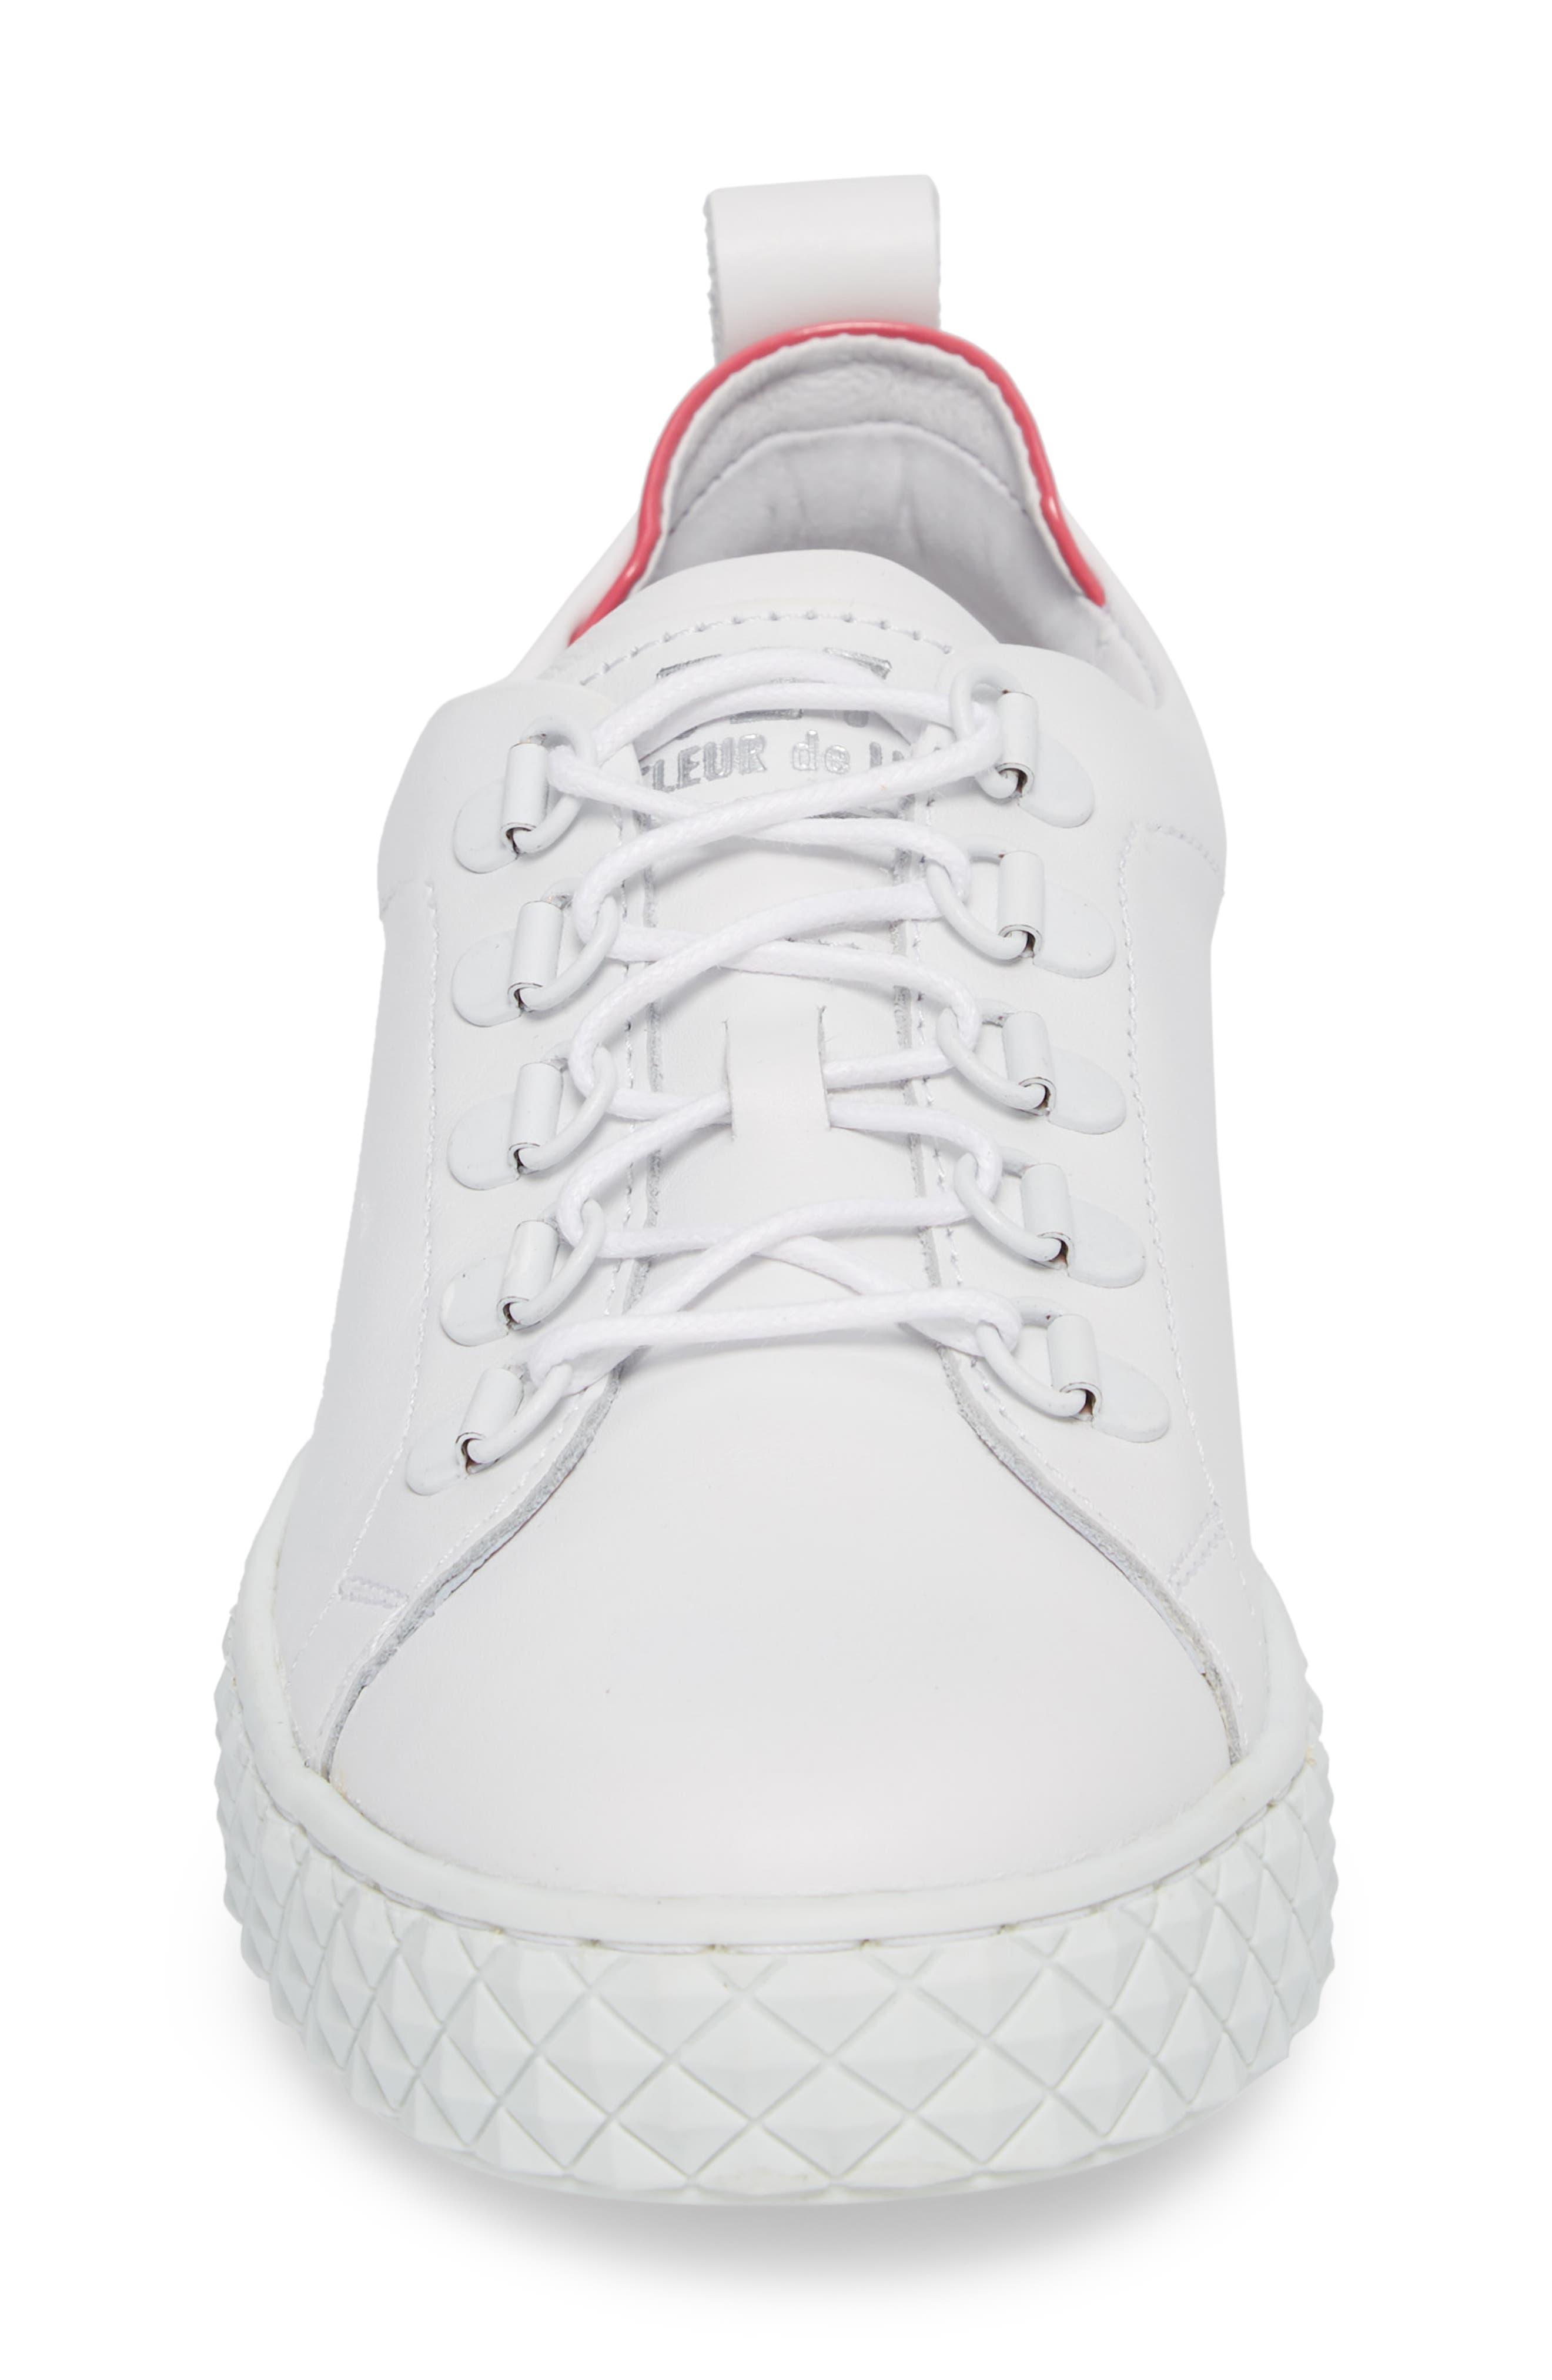 Sol Sneaker,                             Alternate thumbnail 4, color,                             Optic White/ Fuchsia Leather